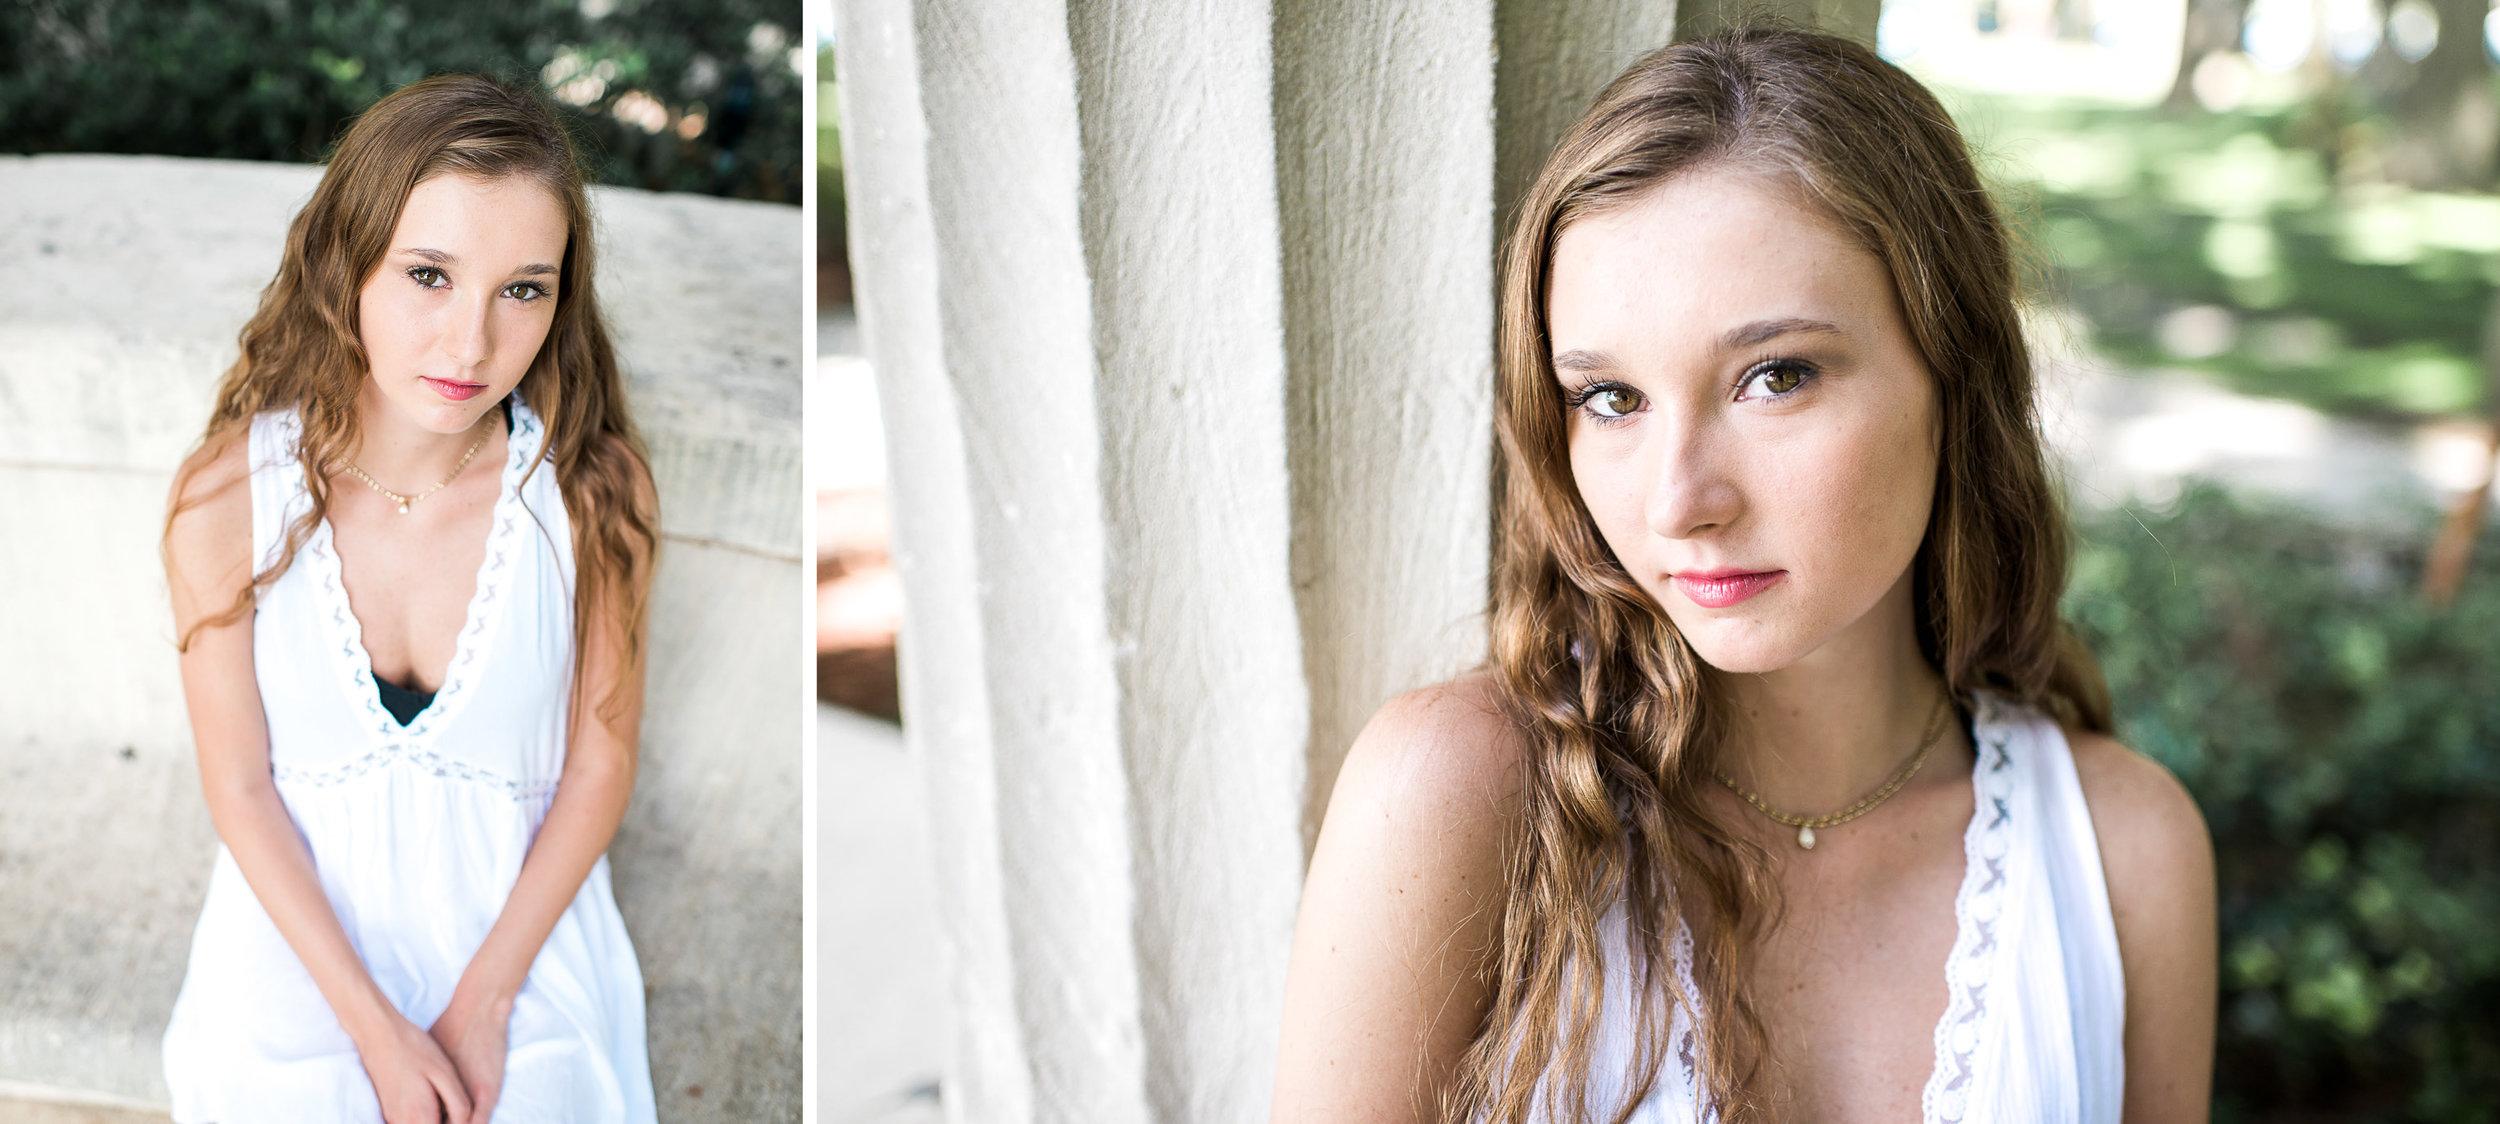 KateTaramykinStudios-Winter-Park-Portrait-Photographer-Amy-8.jpg